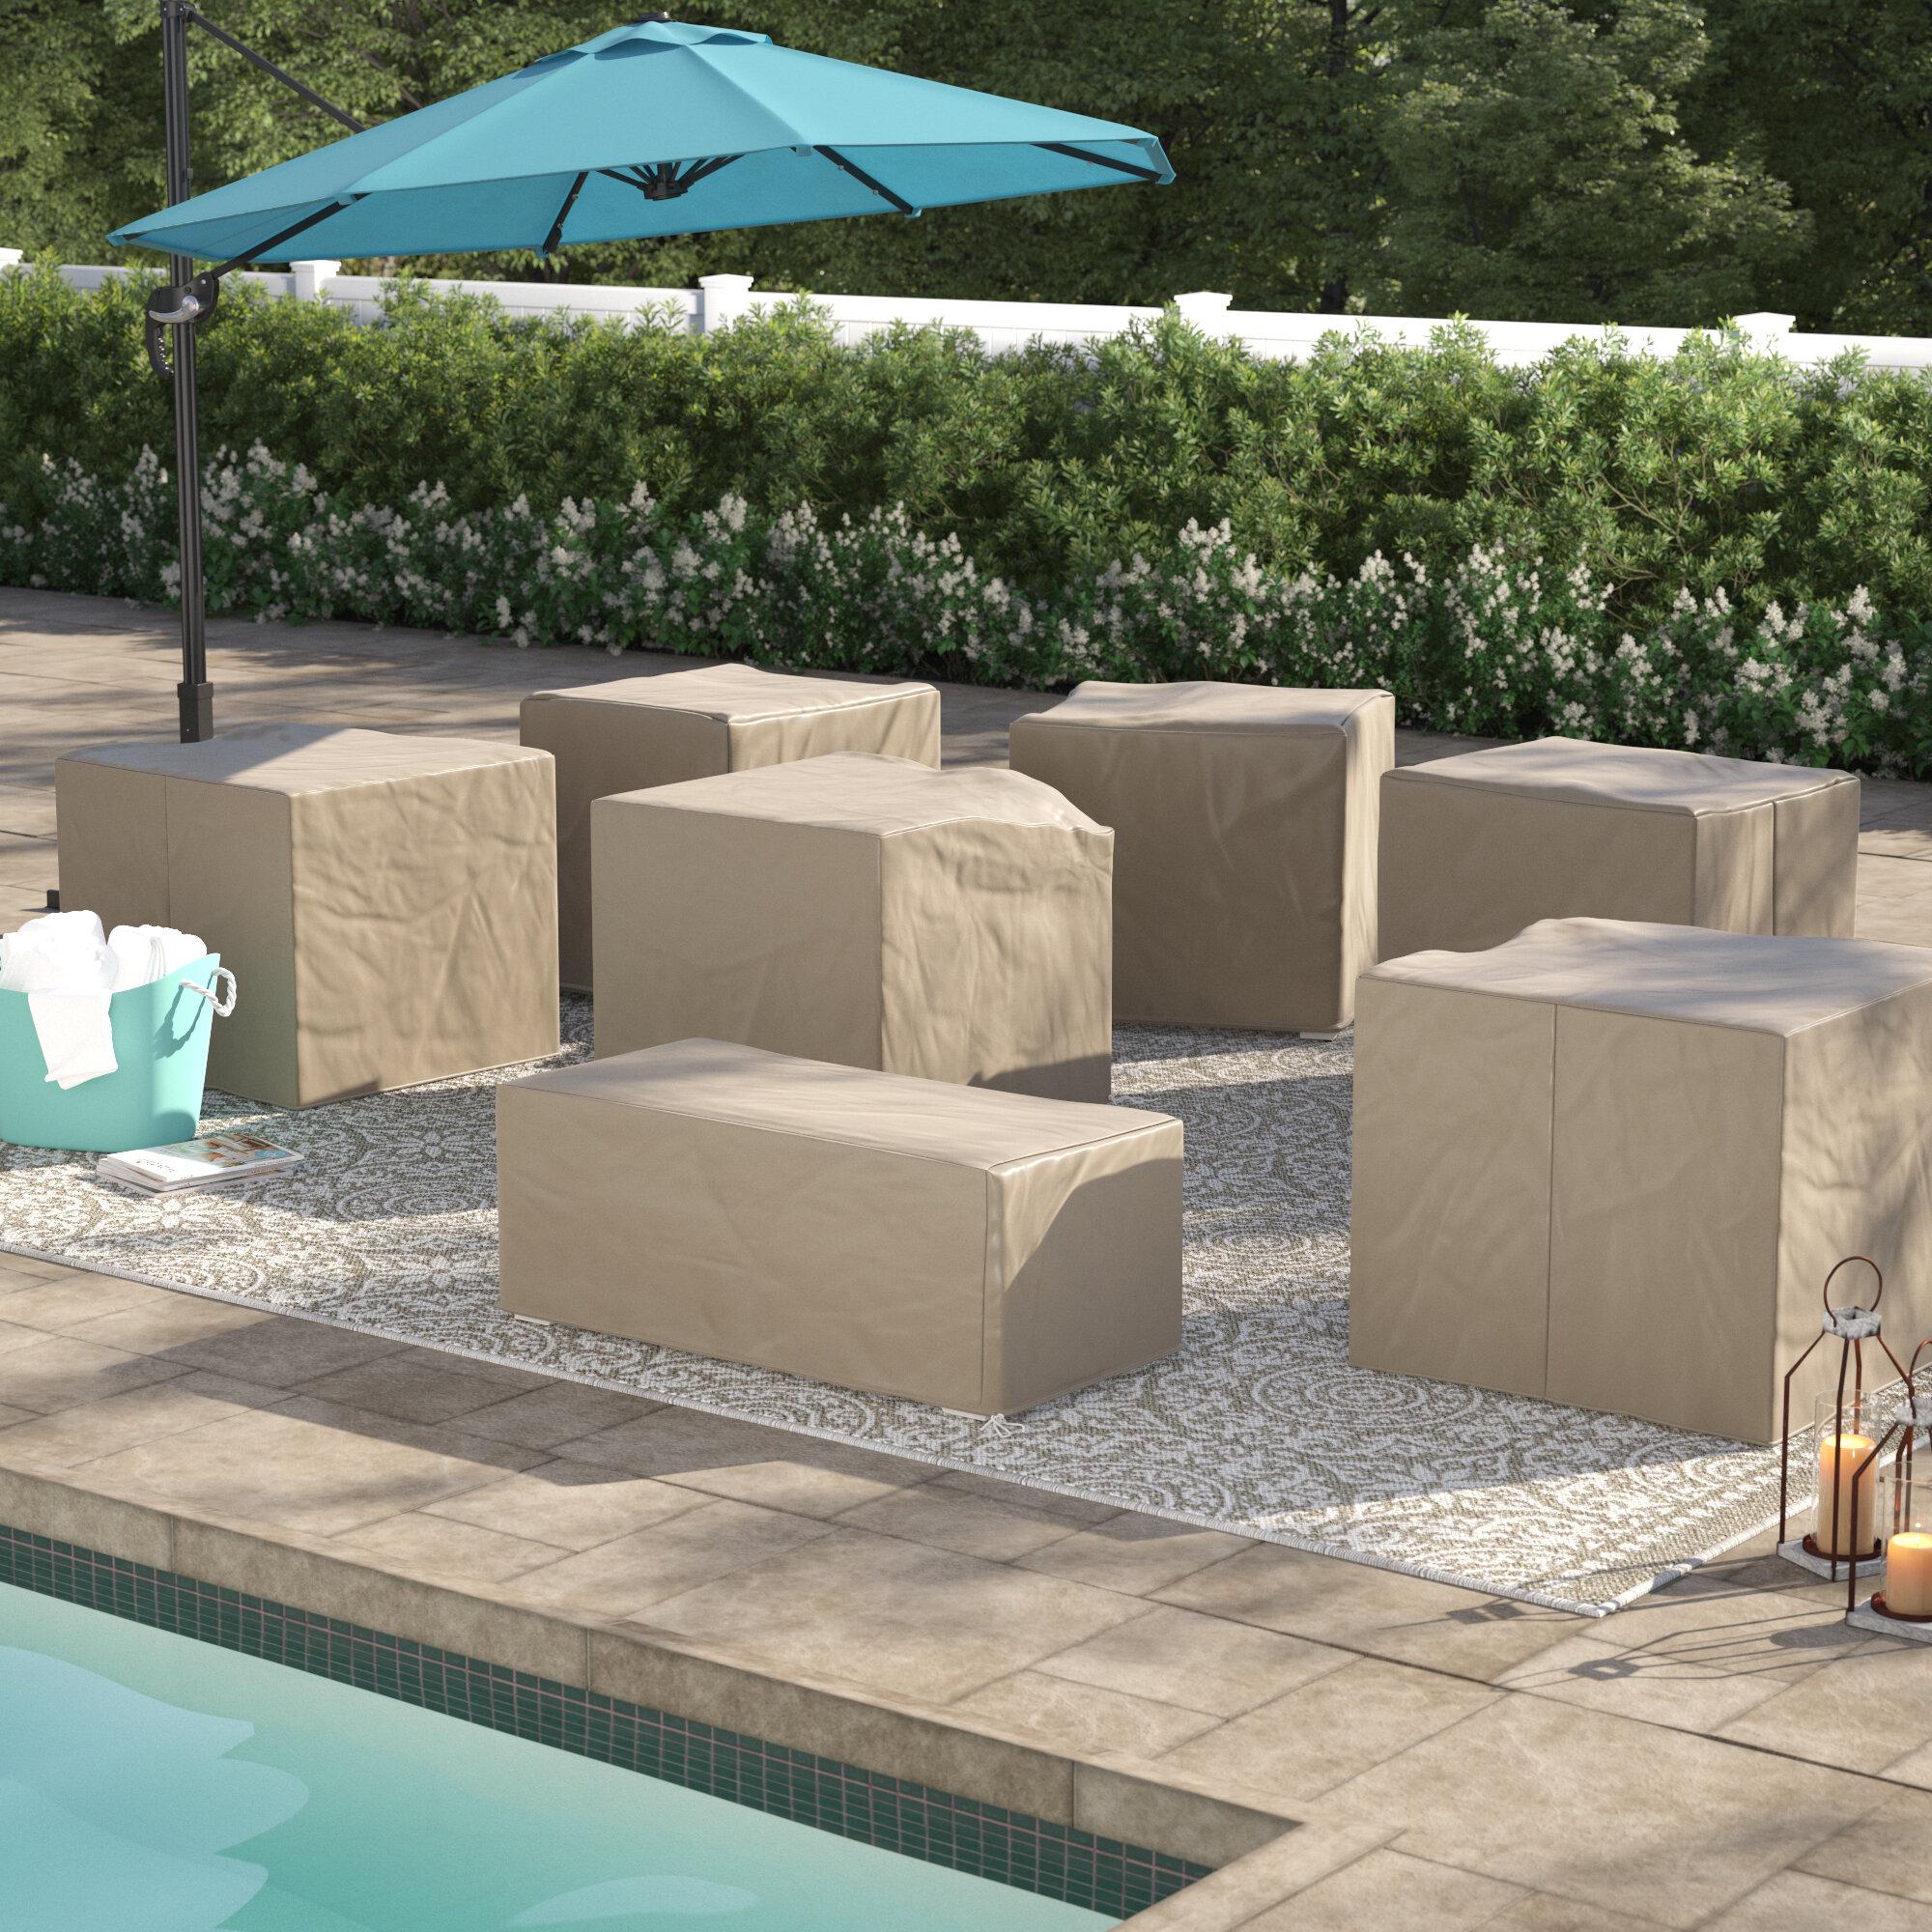 Sol 72 Outdoor Tegan Water Resistant 7 Piece Patio Sofa Cover Set | Wayfair